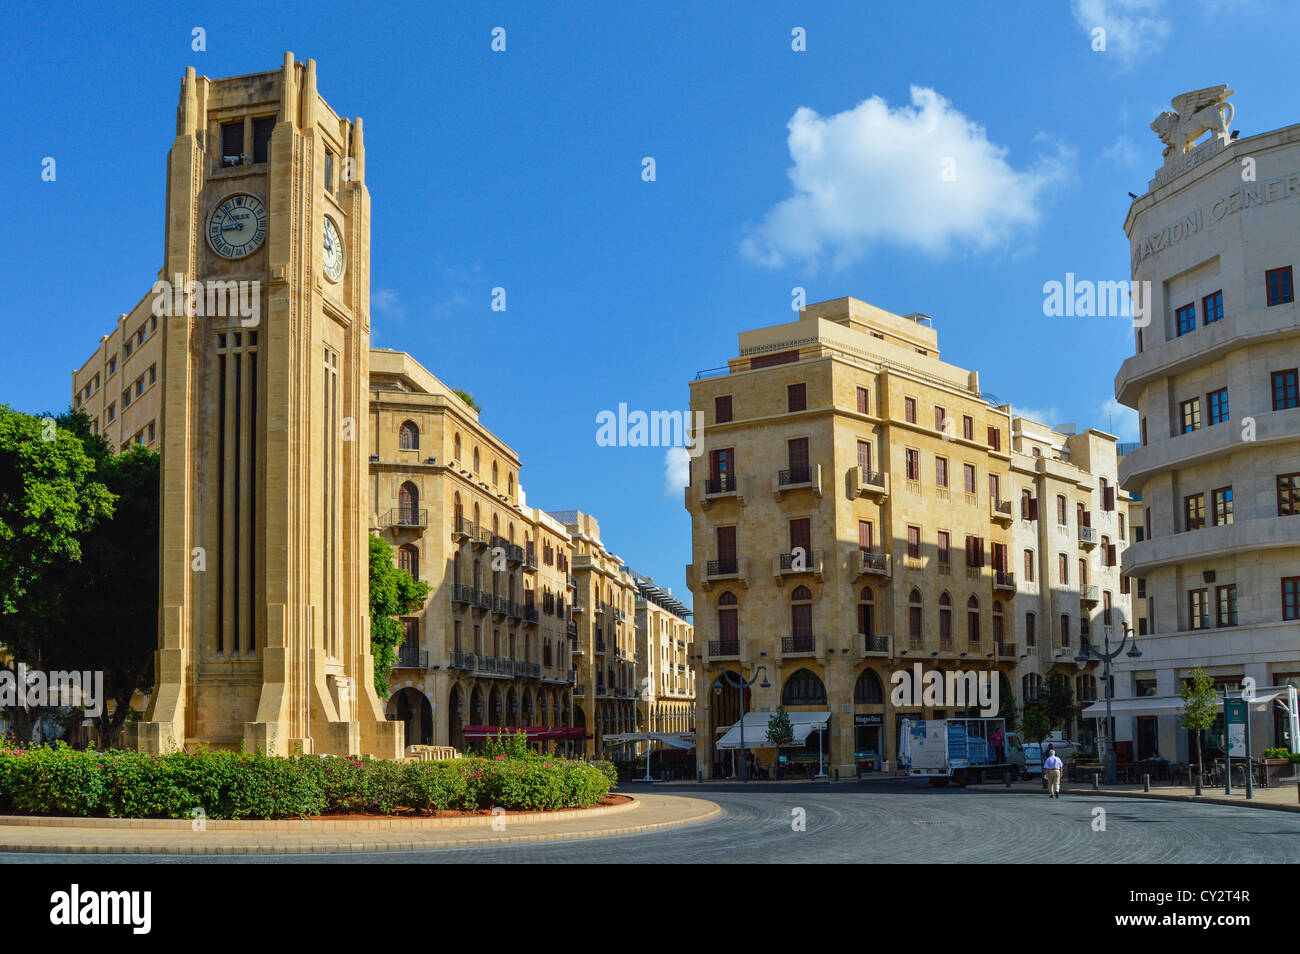 Torre del Reloj otomana, Nejme Square, el centro de Beirut, Líbano, Oriente Medio Imagen De Stock